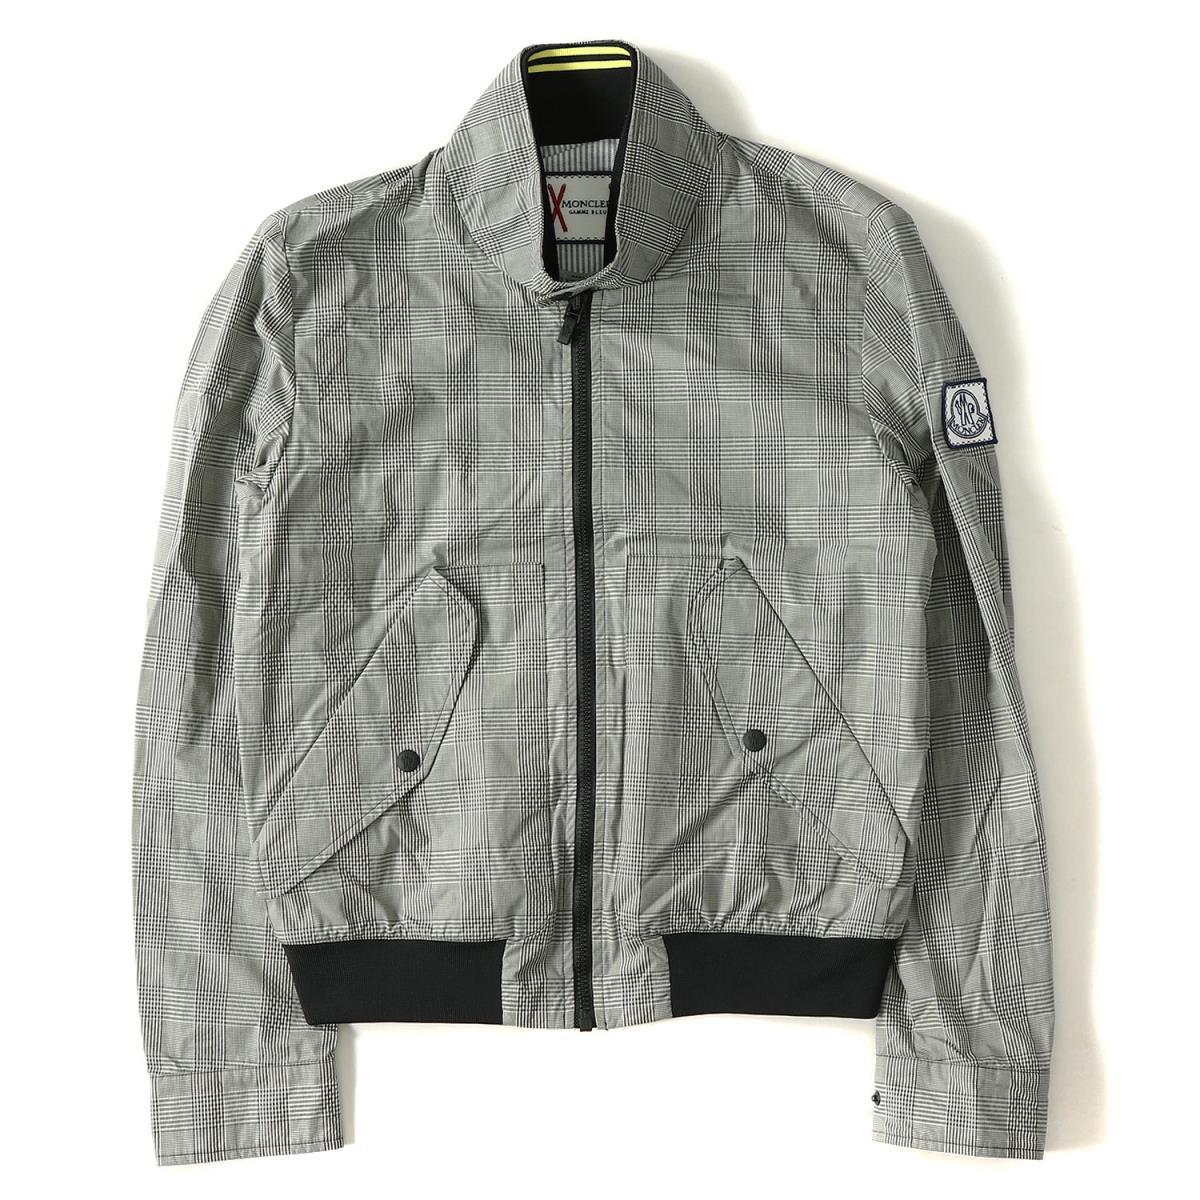 MONCLER GAMME BLEU (Monk rail gum blue) glen check Harrington jacket gray 1